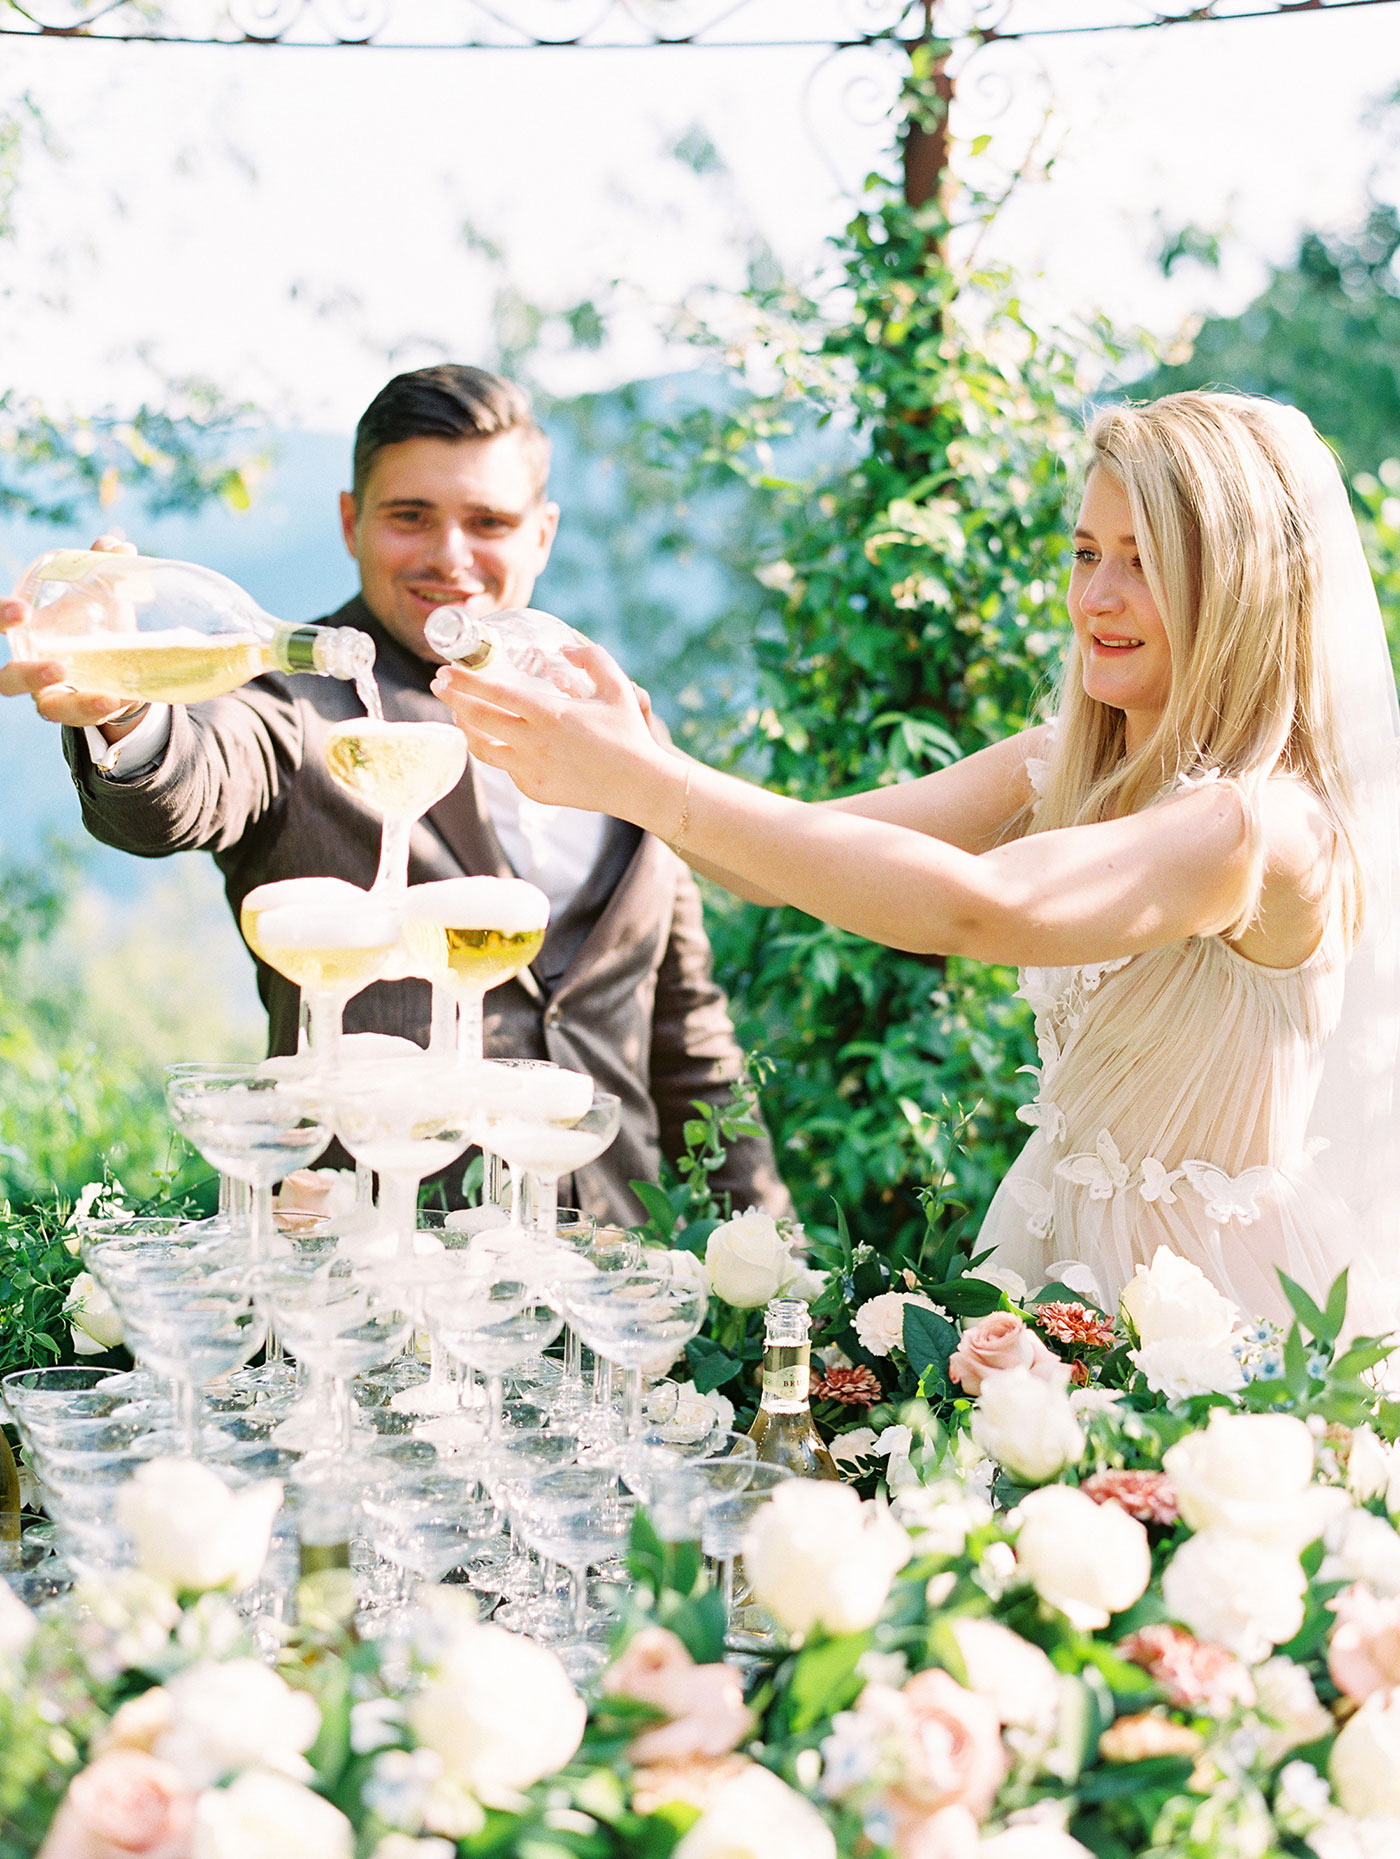 julia franz wedding champagne tower couple